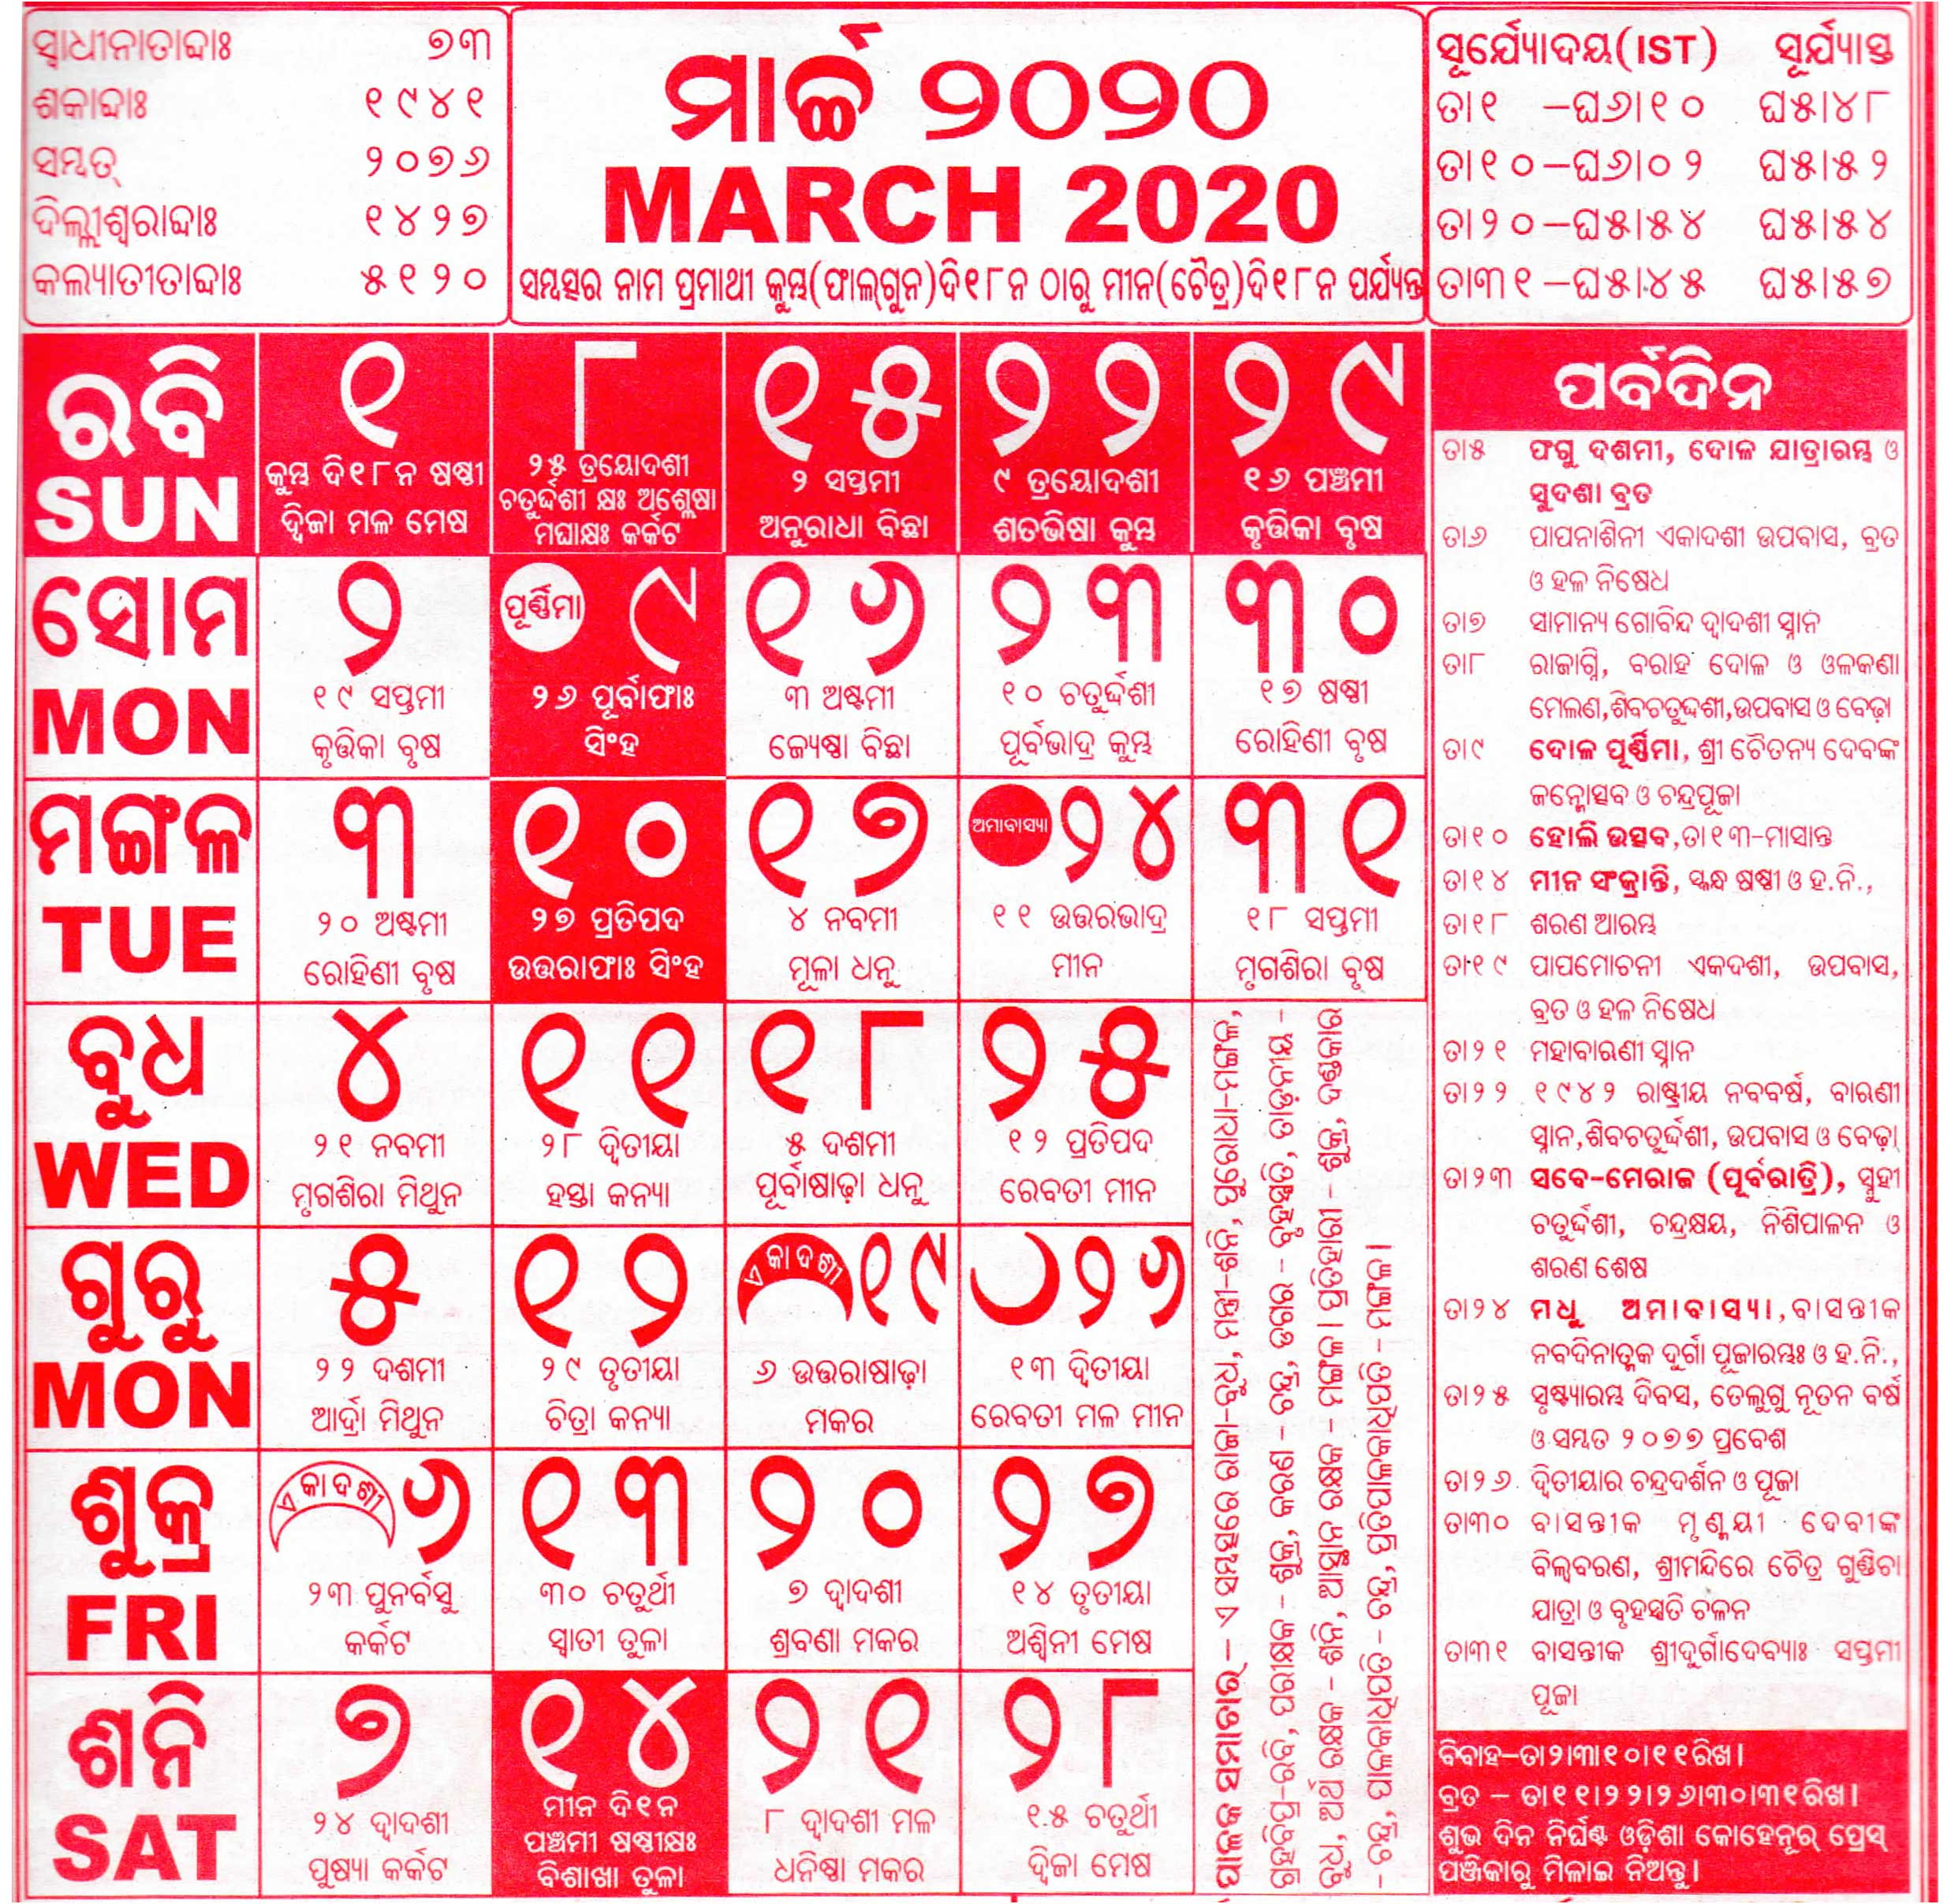 Odia Calendar March 2020 | | Calendarcraft regarding 2020 Oriya Calendar